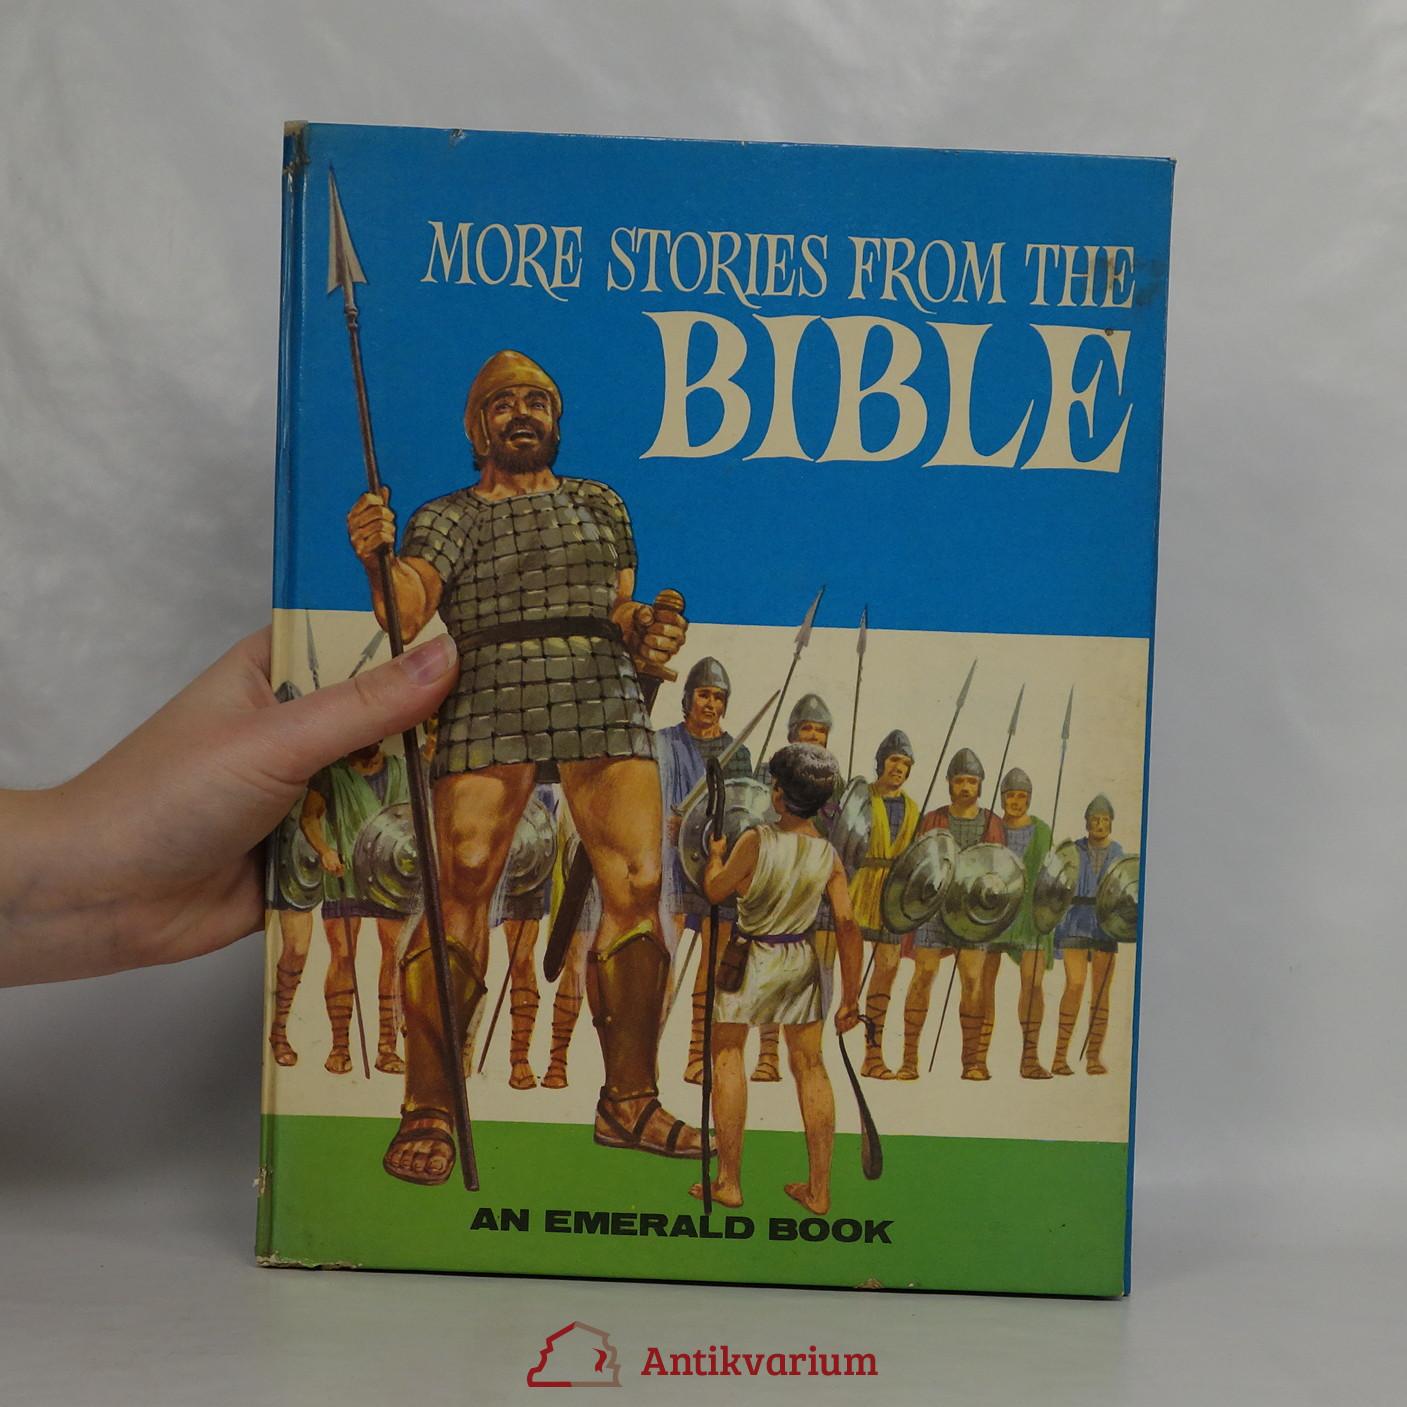 antikvární kniha More stories from the Bible, neuveden